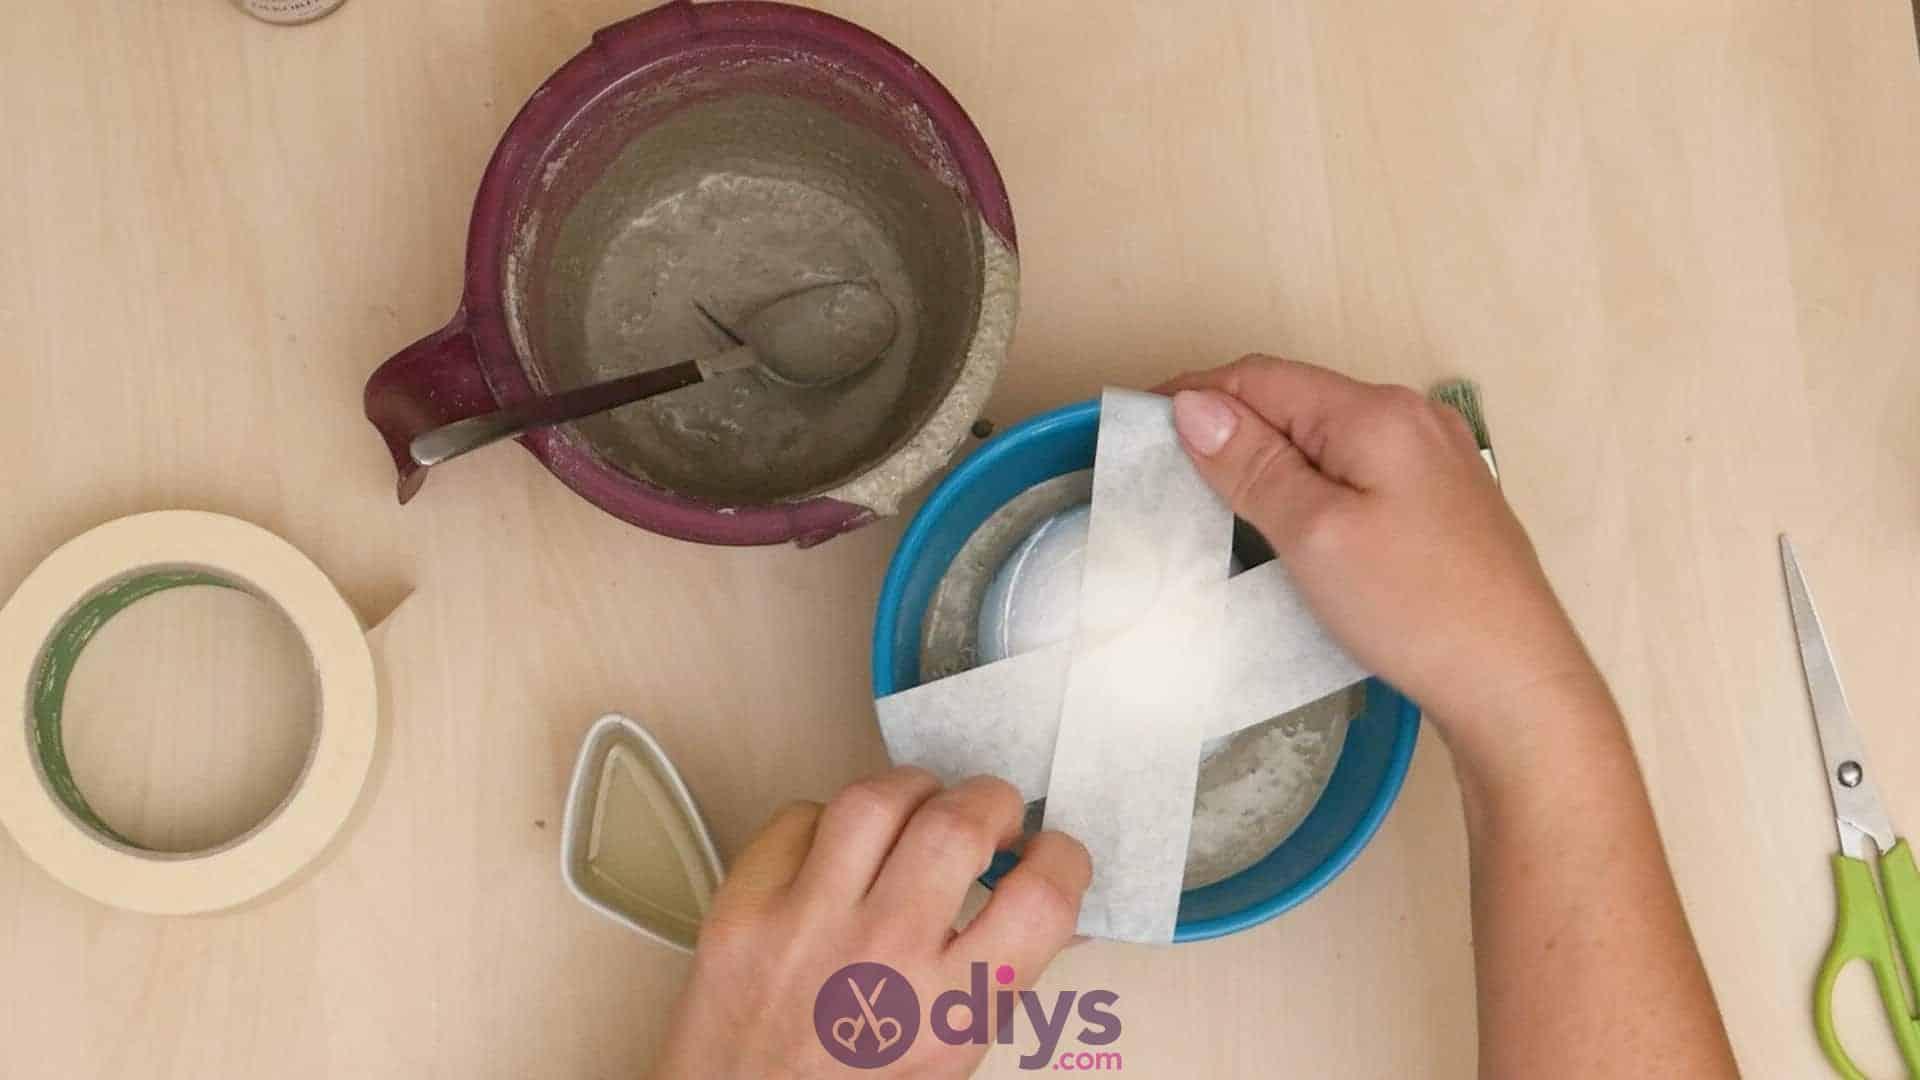 Diy concrete ashtray step 4b